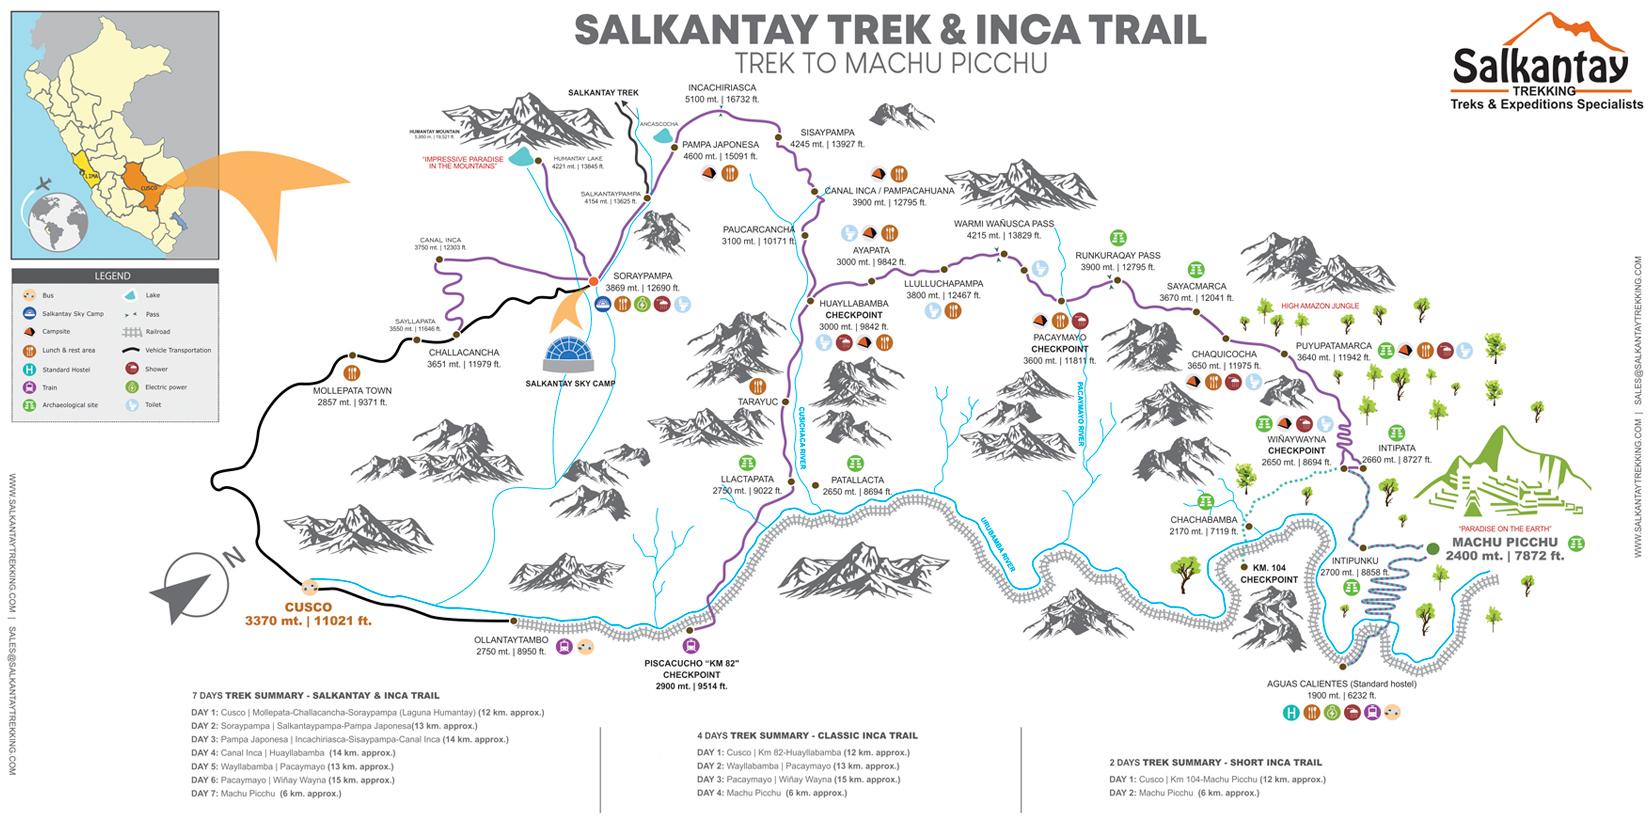 SALKANTAY - INCA TRAIL   Salkantay, Inca Trail, Machu Picchu on appalacian trail map, inca trail map, santa cruz trail map, mountain trail map, machu picchu trail map, huayna picchu trail map, tuckerman ravine trail map, fat man's pass trail map,